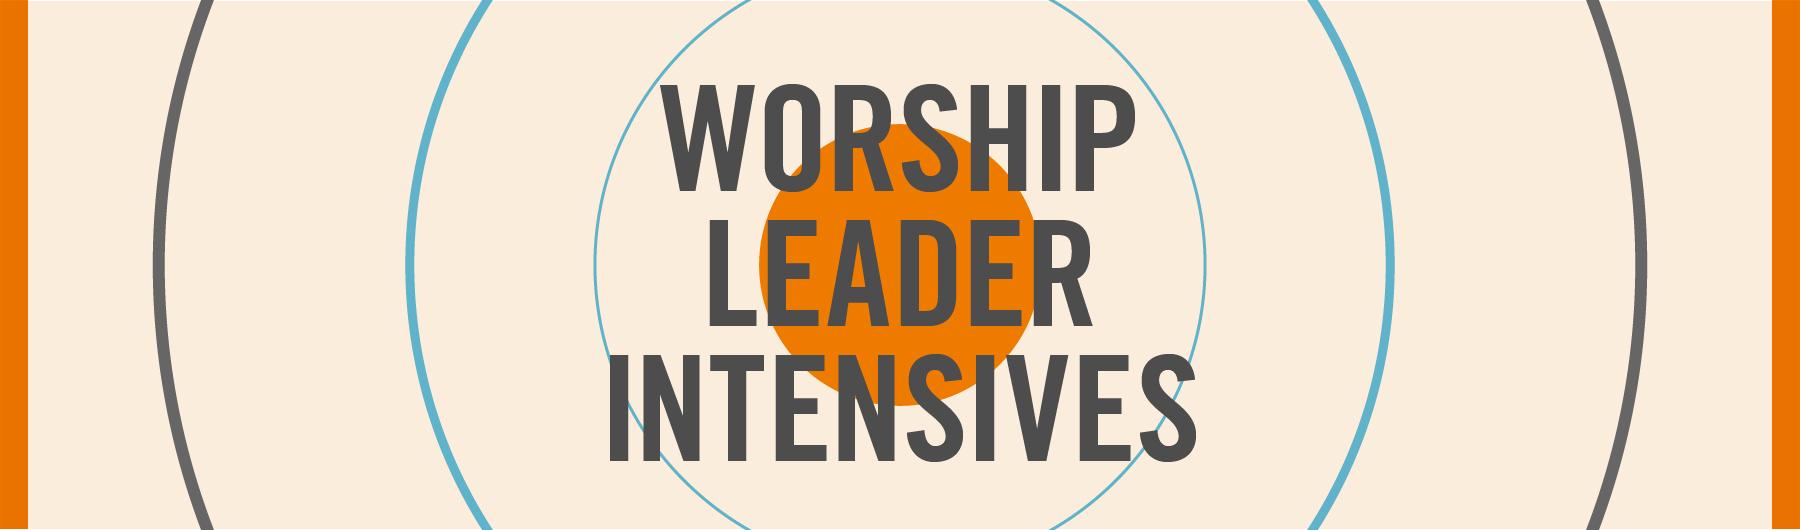 Worship Leader Intensive     Aberdeen   Scotland